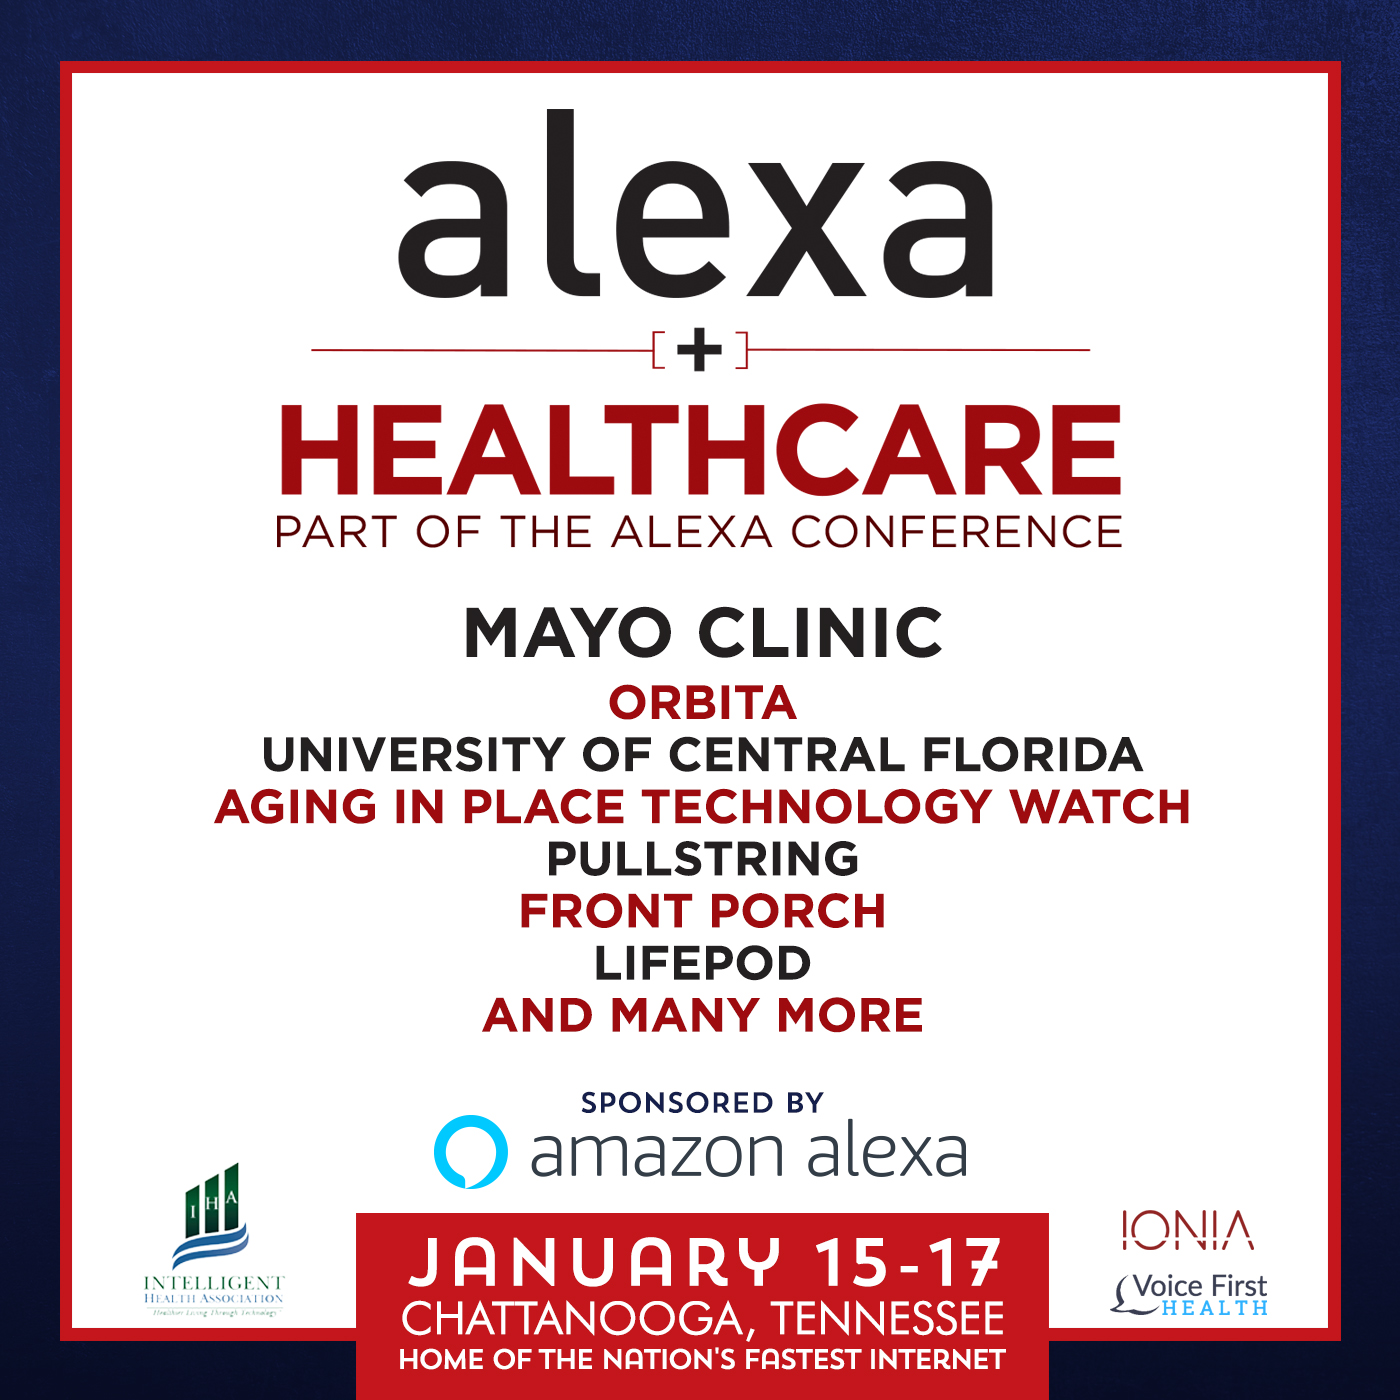 Alexa + Healthcare Flier.jpg